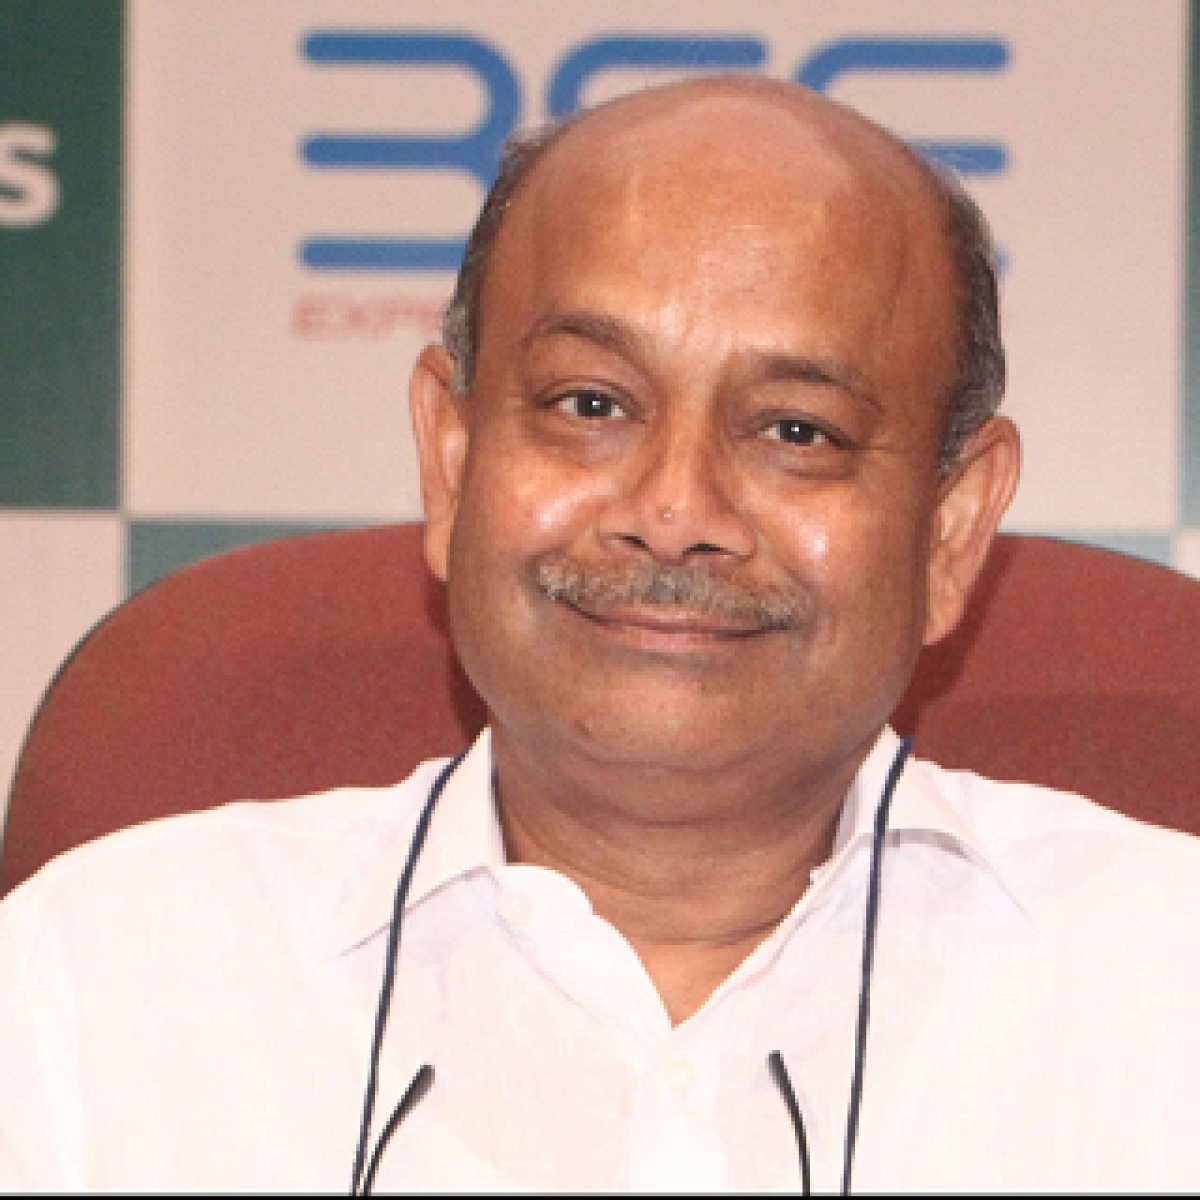 Fighting the coronavirus storm: DMart founder Radhakishan Damani becomes richer amid lockdown in India